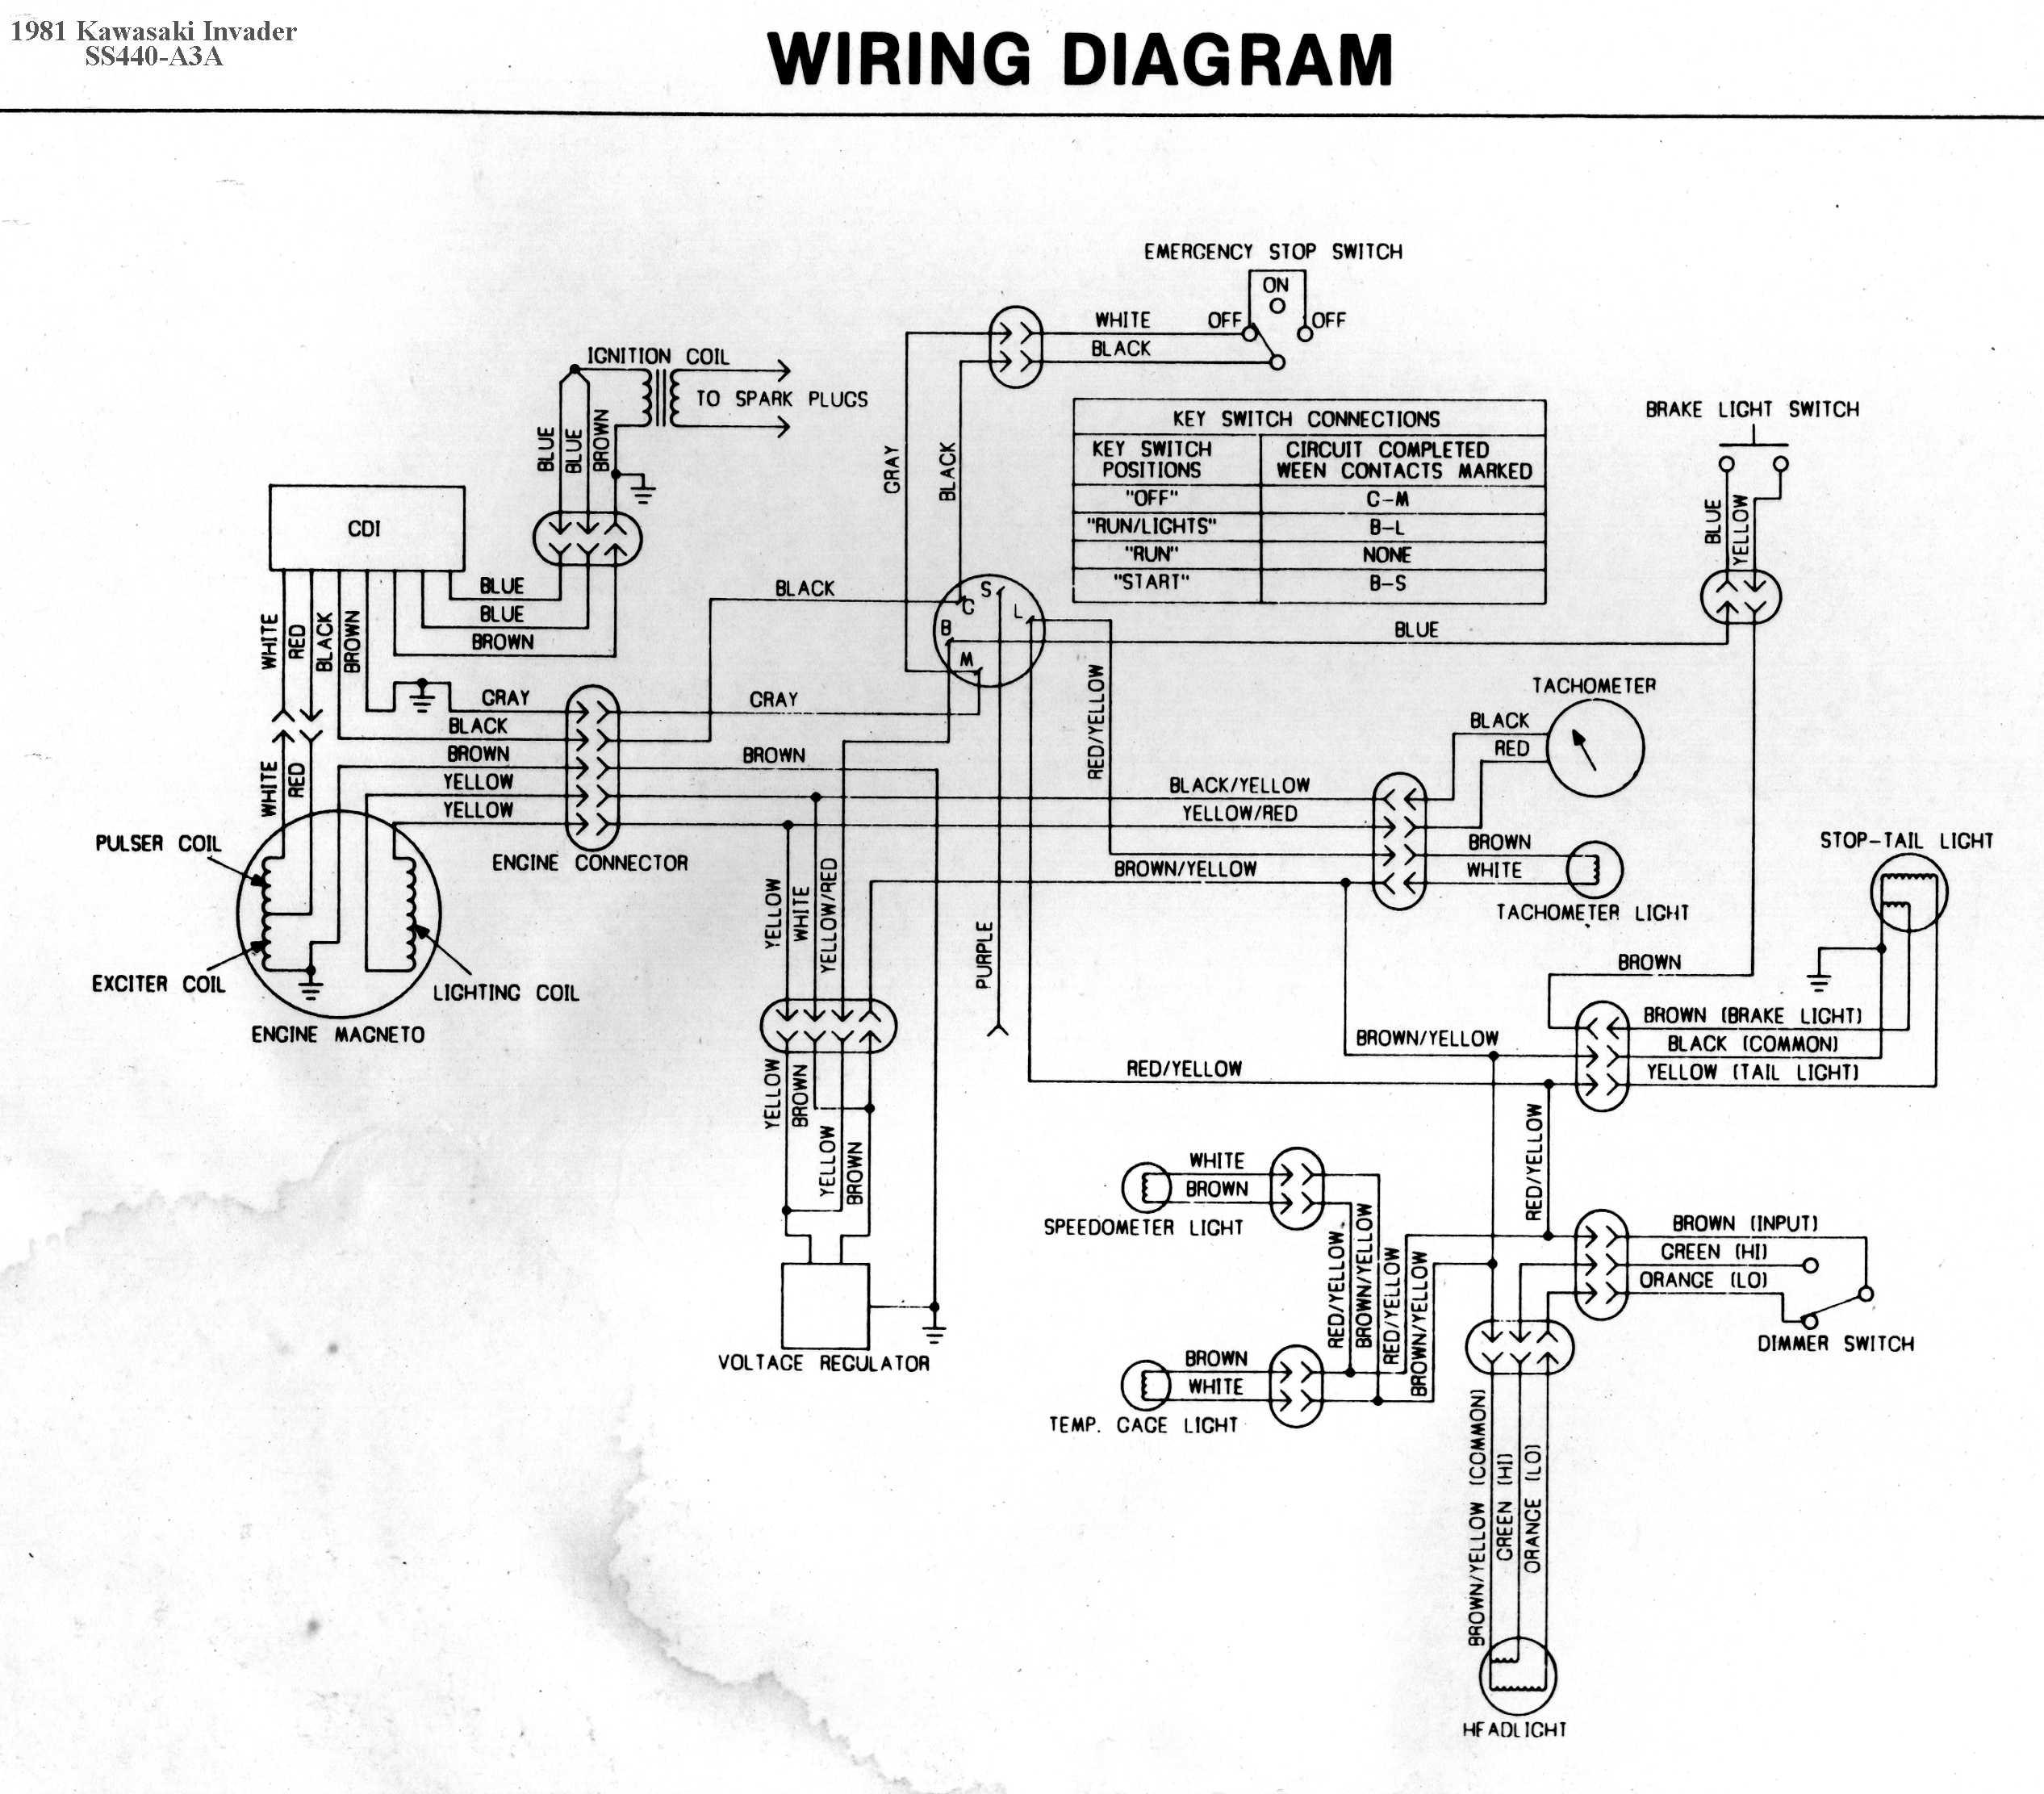 yamaha enticer wiring diagram / yamaha enticer wiring diagram 1978 1981 yamaha  enticer et250 snowmobile service manual on this page you can download yamaha  outboard service manual wiring diagram for house /  wiring diagram 7 pin trailer plug